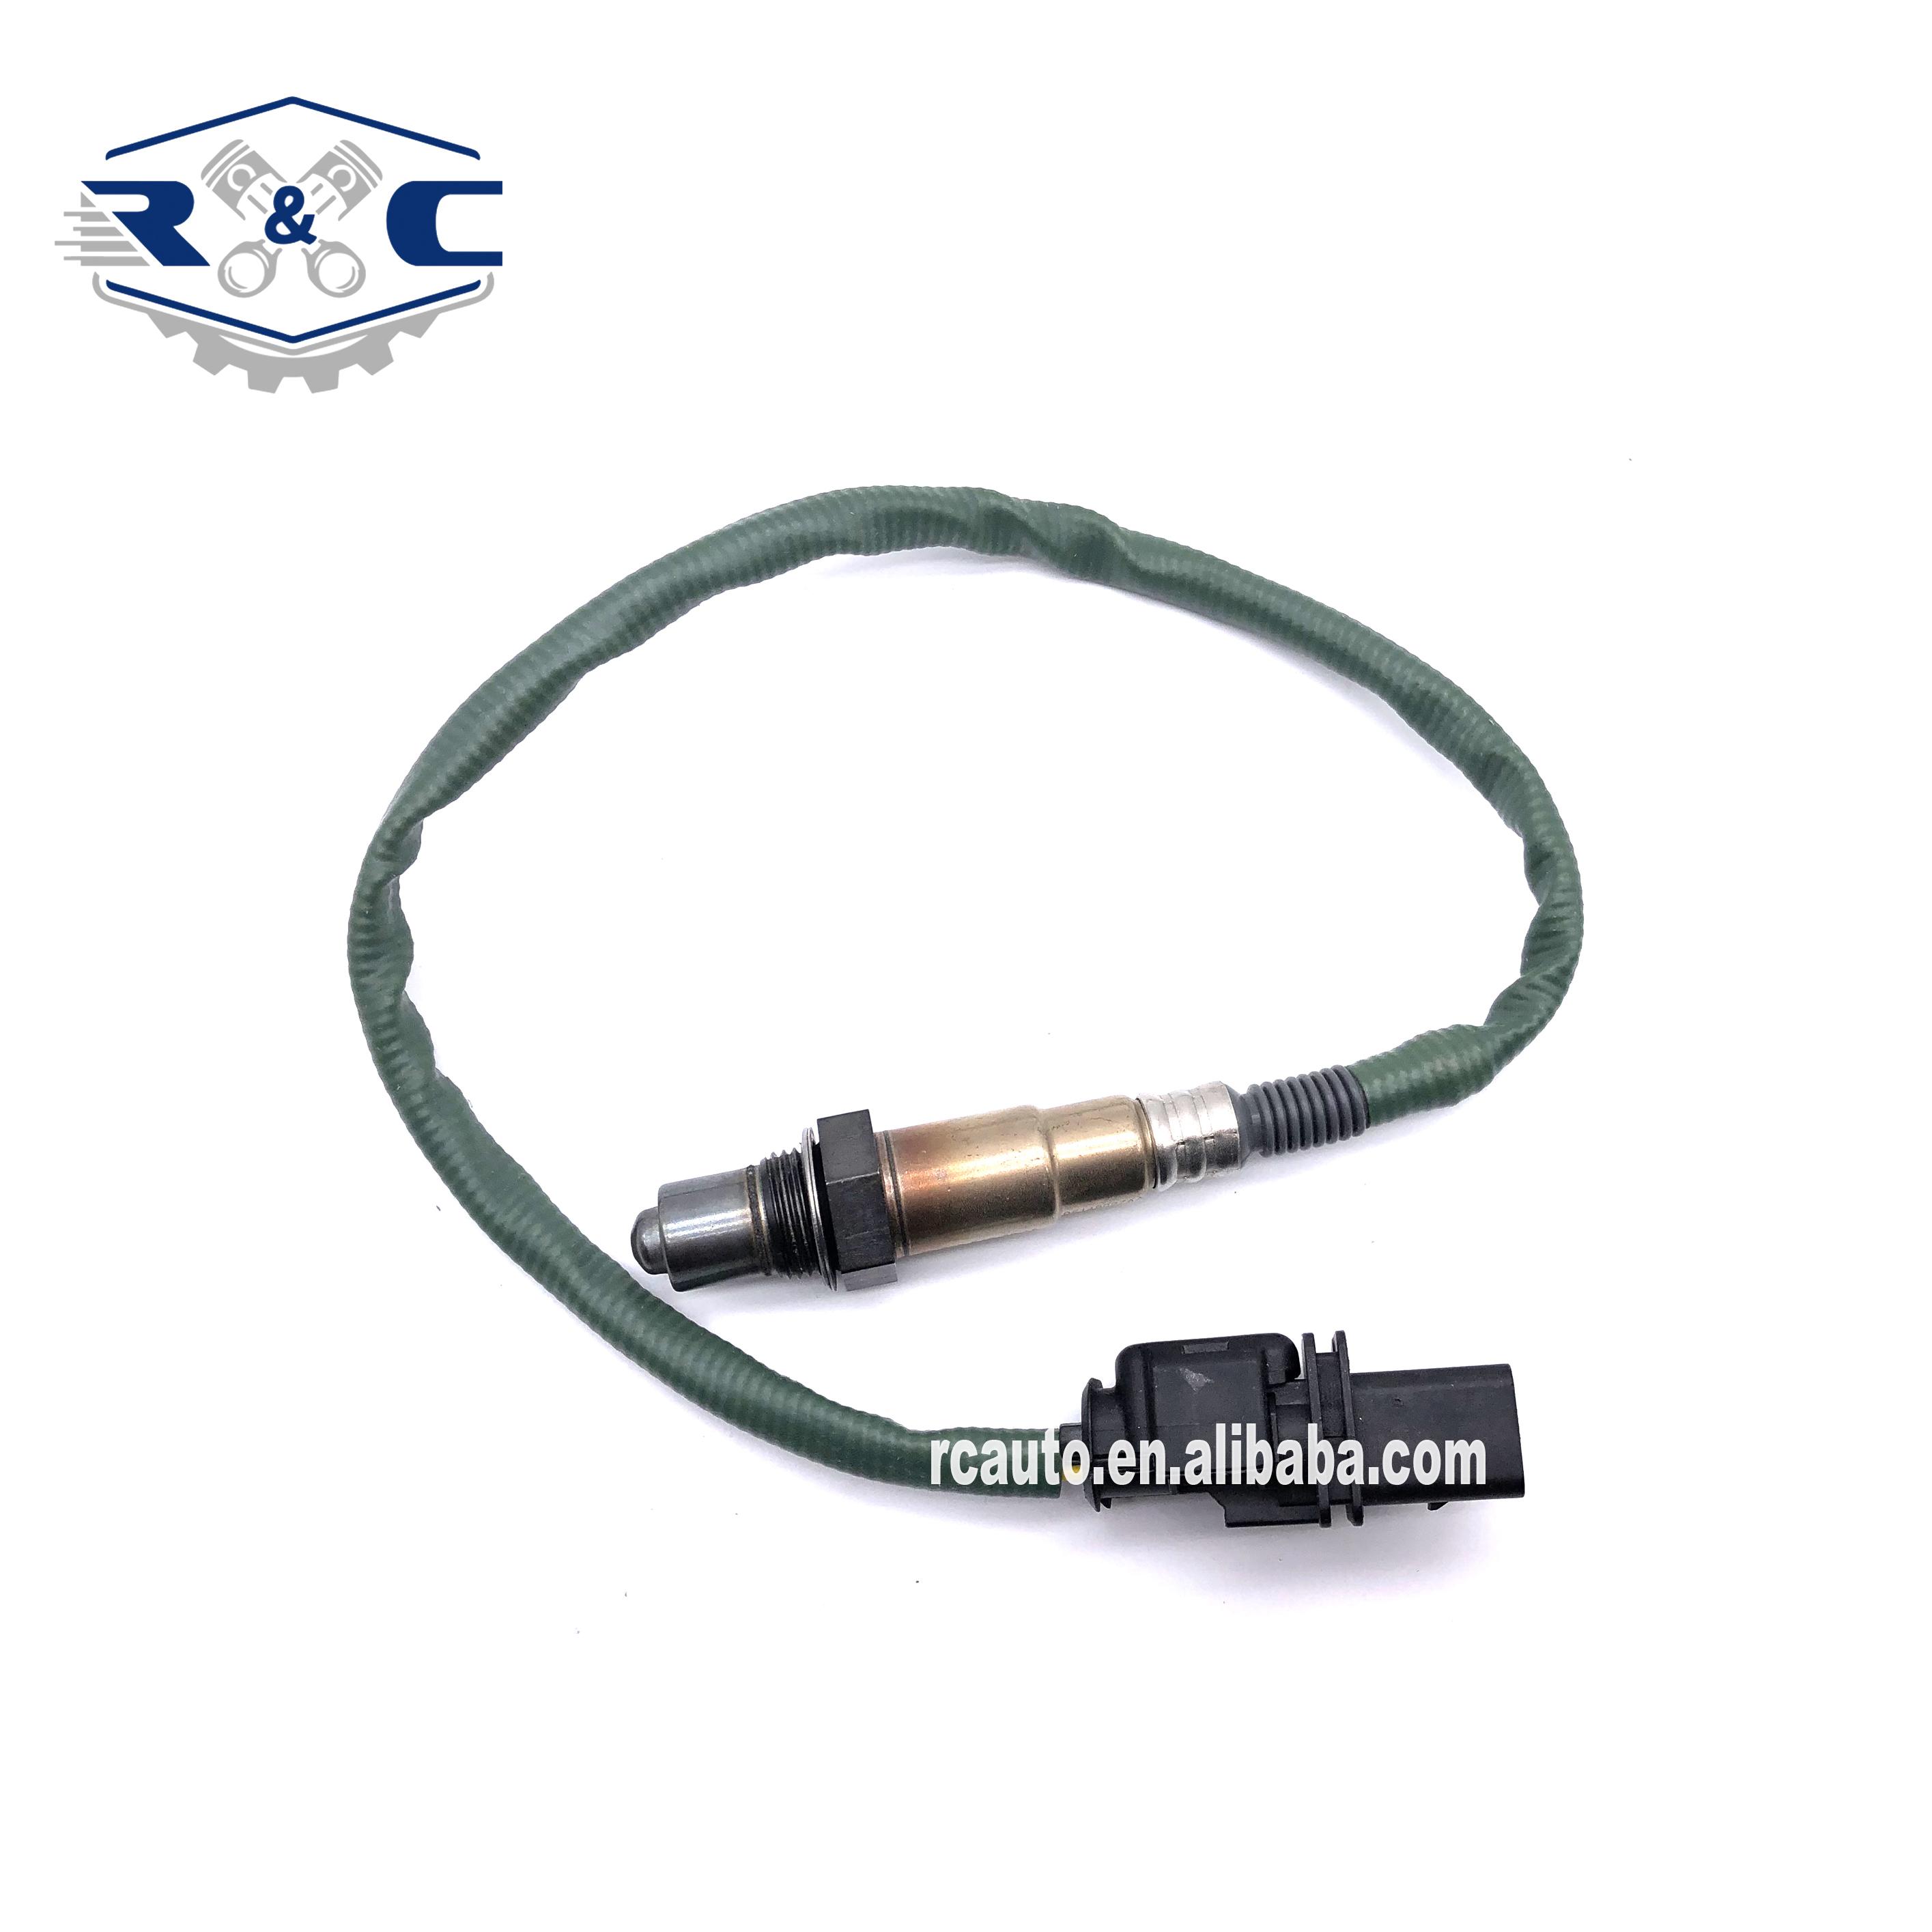 MERCEDES ML 320 W163 3.2 V6 EXHAUST LAMBDA SENSOR 0015402817